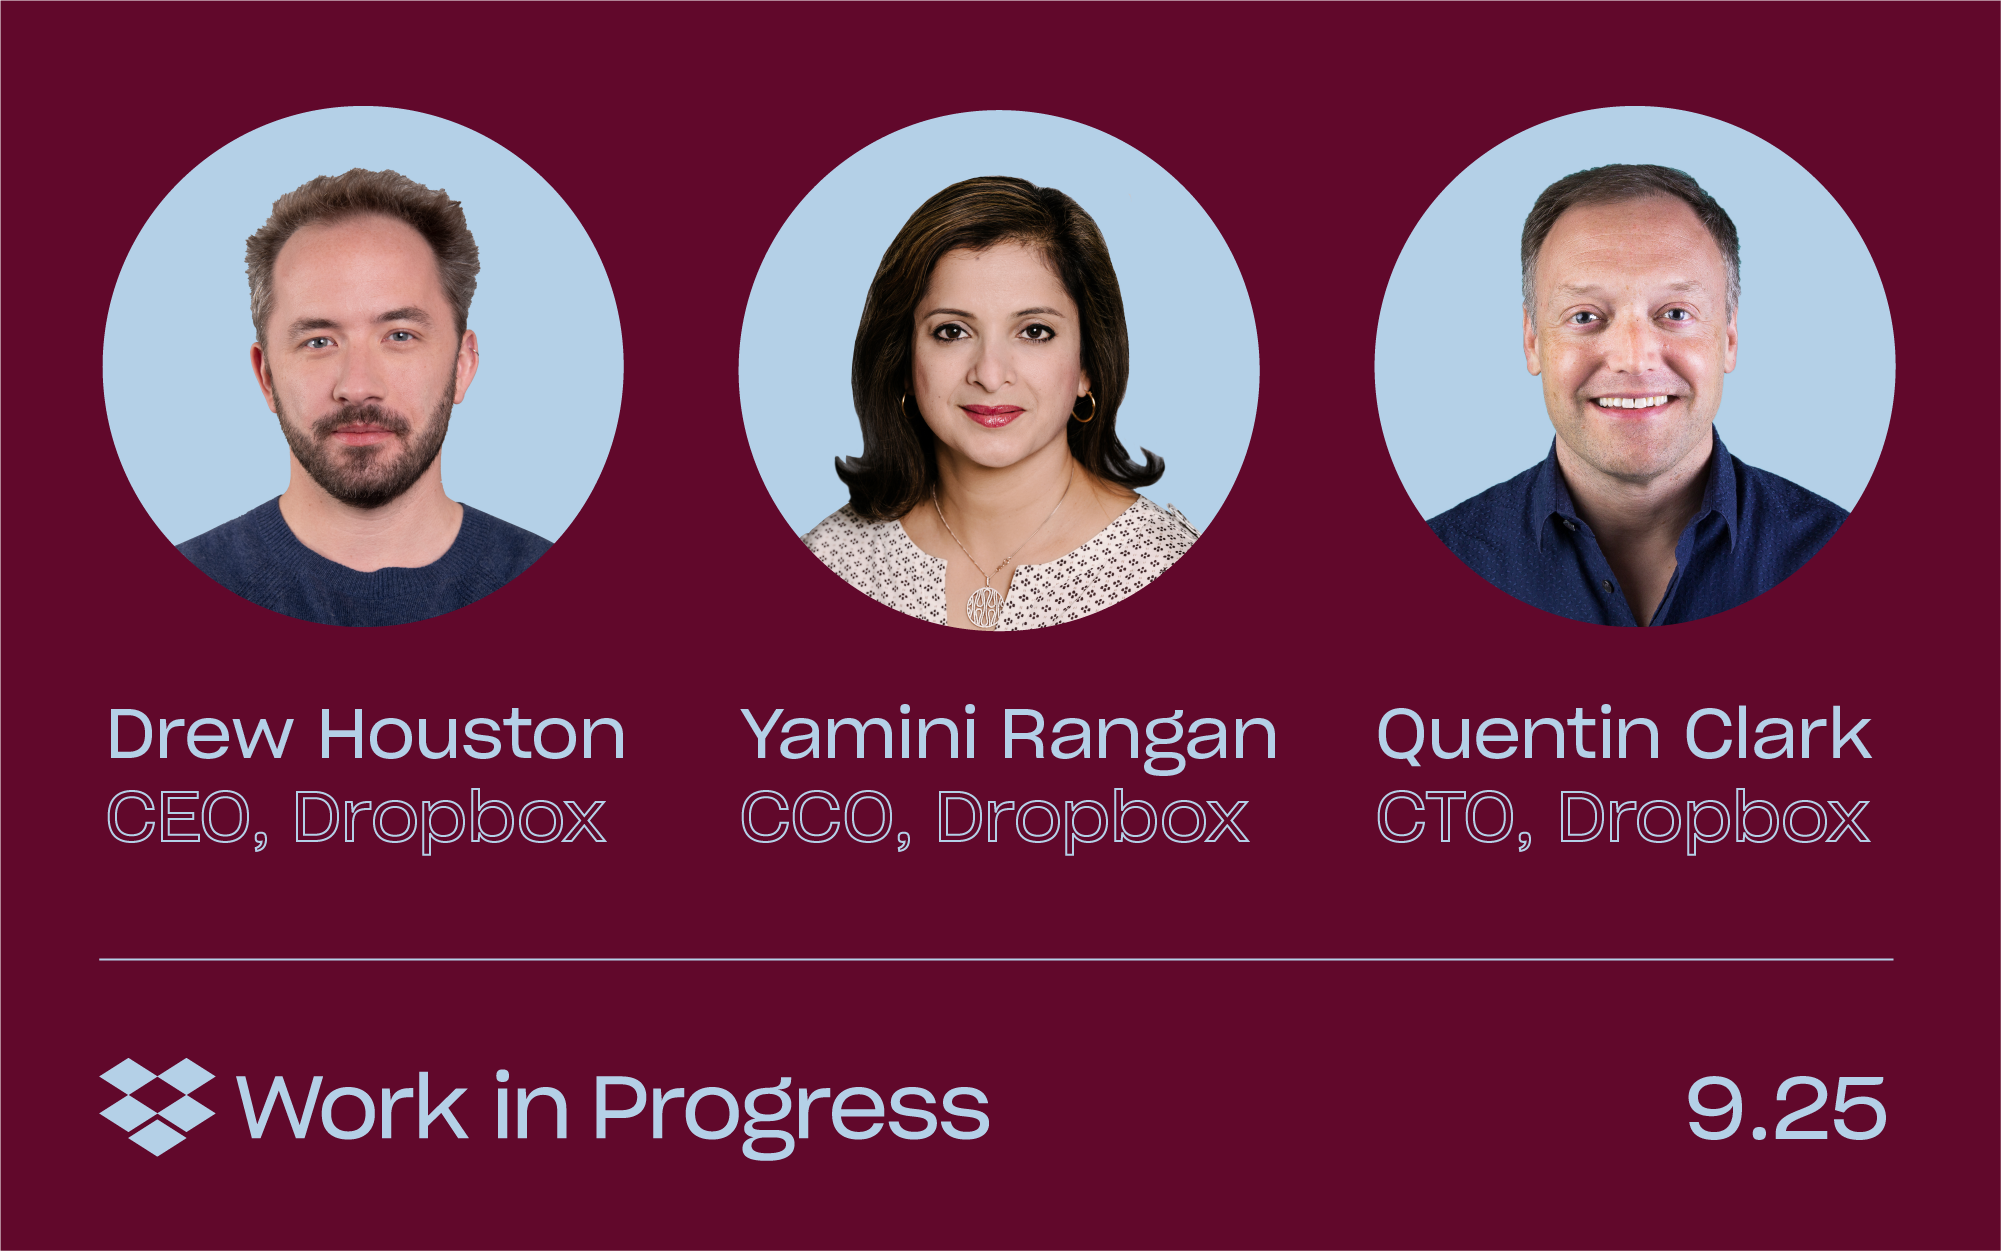 Work in Progress | Dropbox Blog